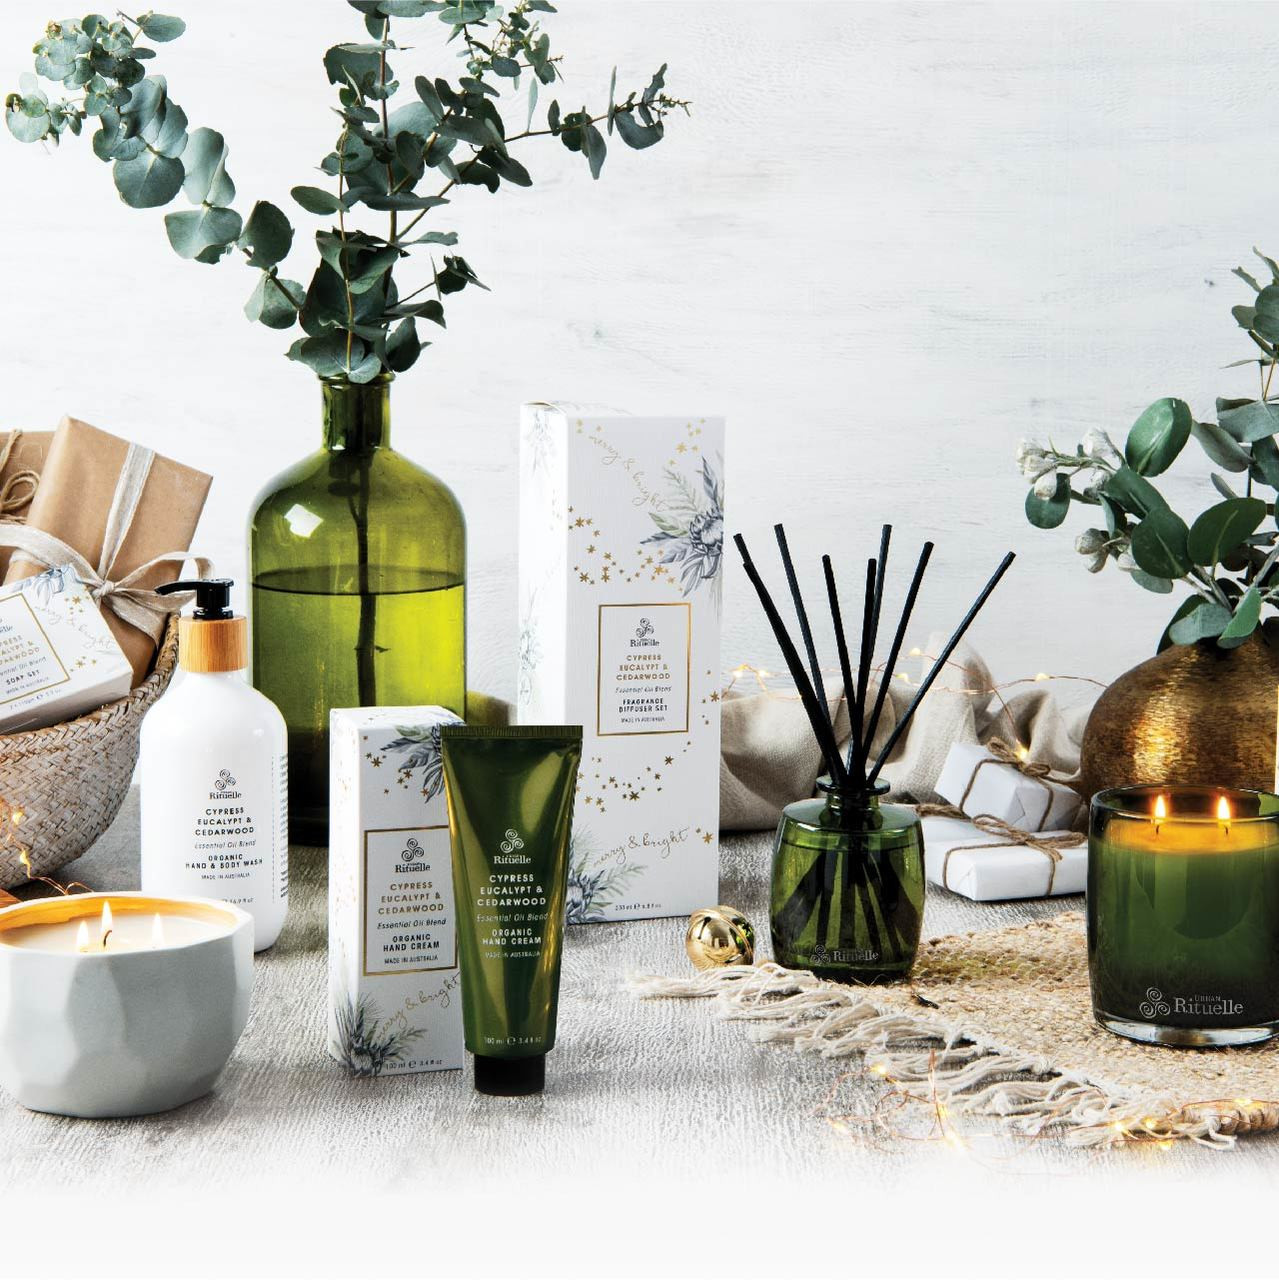 Festive Botanica - Cypress, Eucalypt & Cedarwood - Organic Soap Set - Urban Rituelle